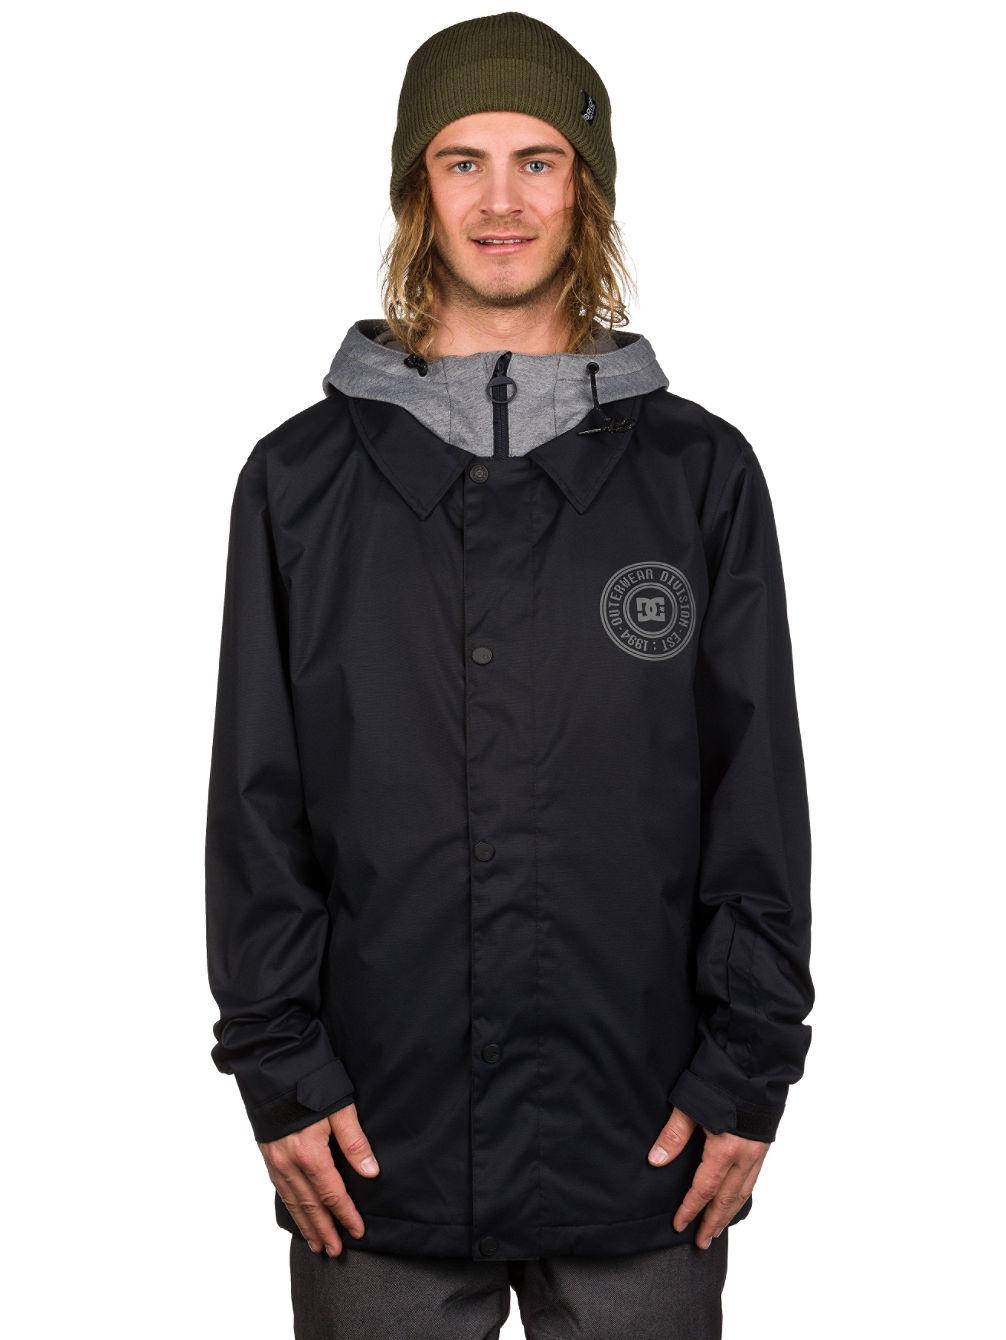 dc-cash-only-jacket